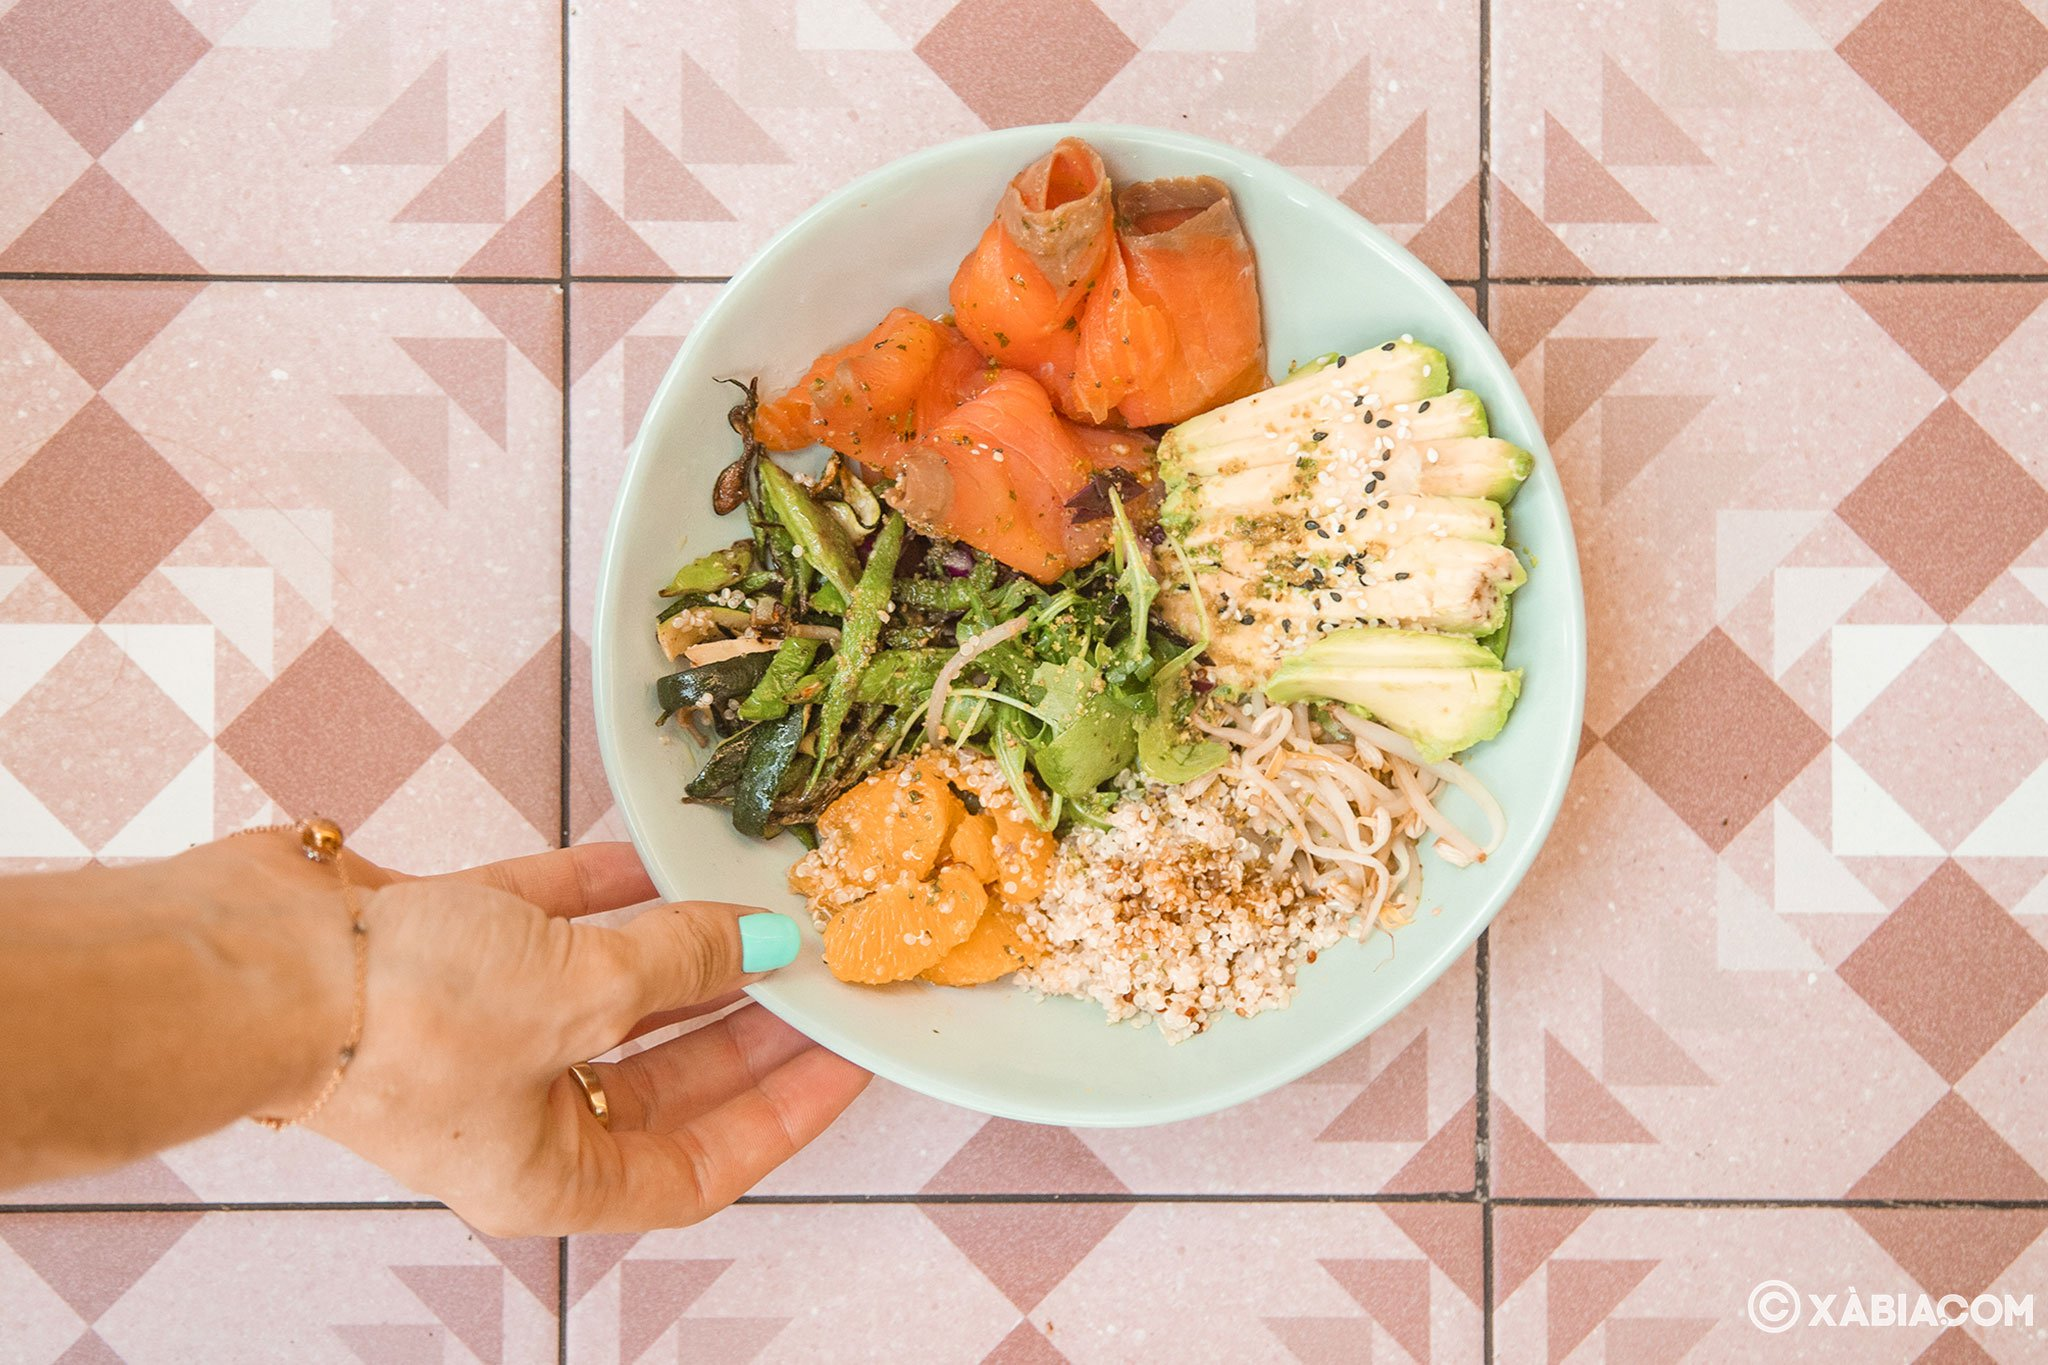 Ammos Salty & Sweet – Restaurante Ammos